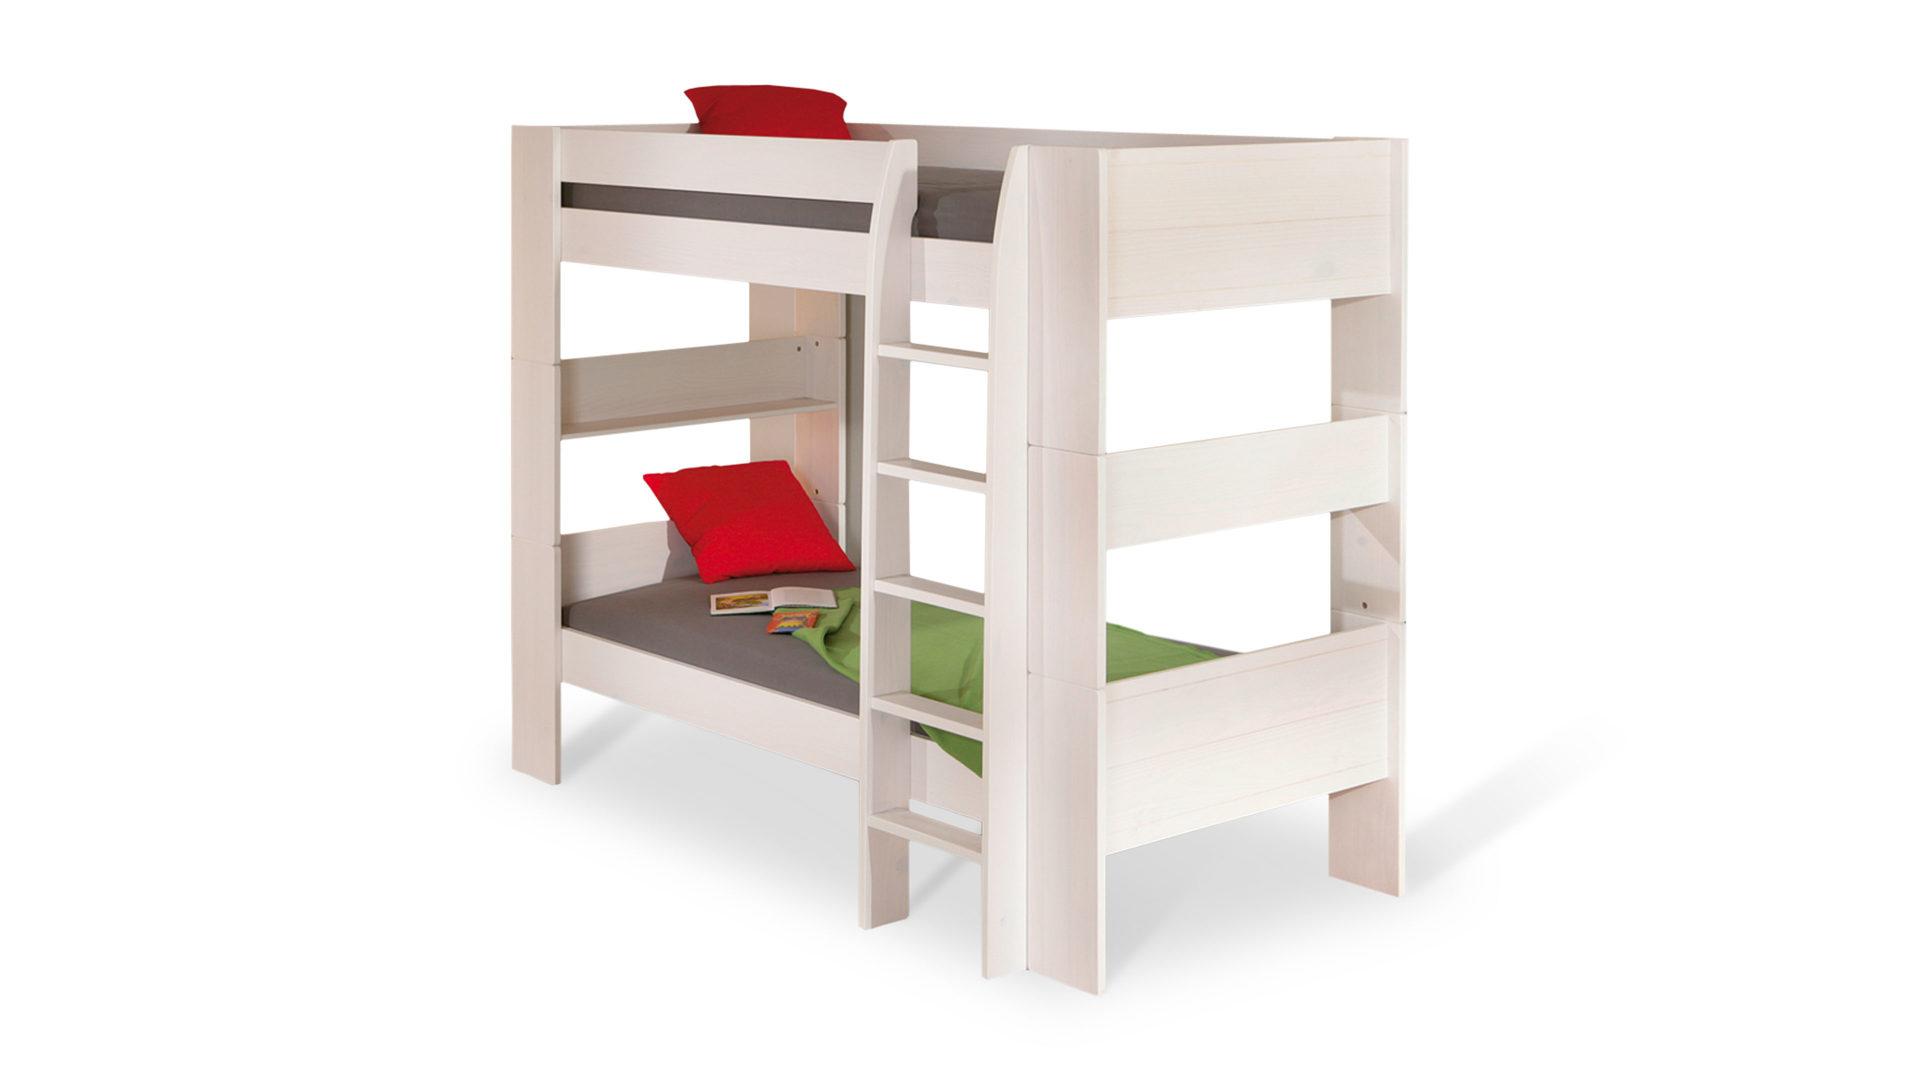 Hochbett Holz Massiv Weiß : Hertel möbel e.k. gesees etagenbett dream well 3 ein